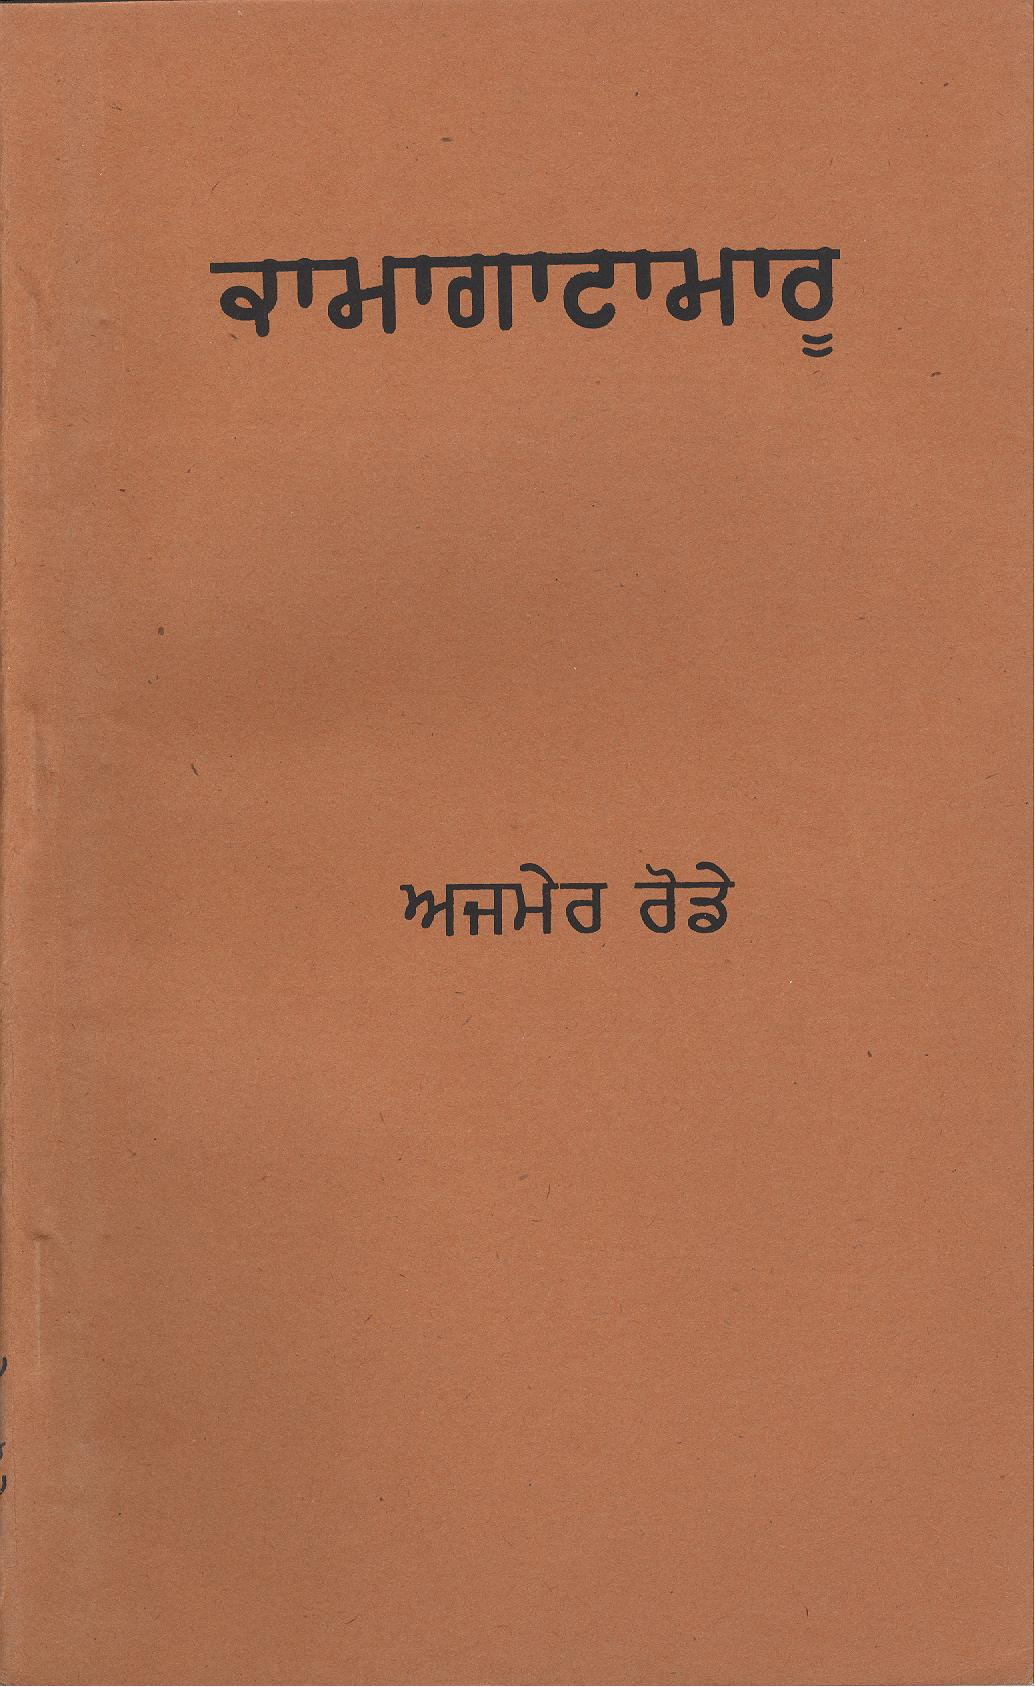 Komagata Maru COVER 2nd edition-1999